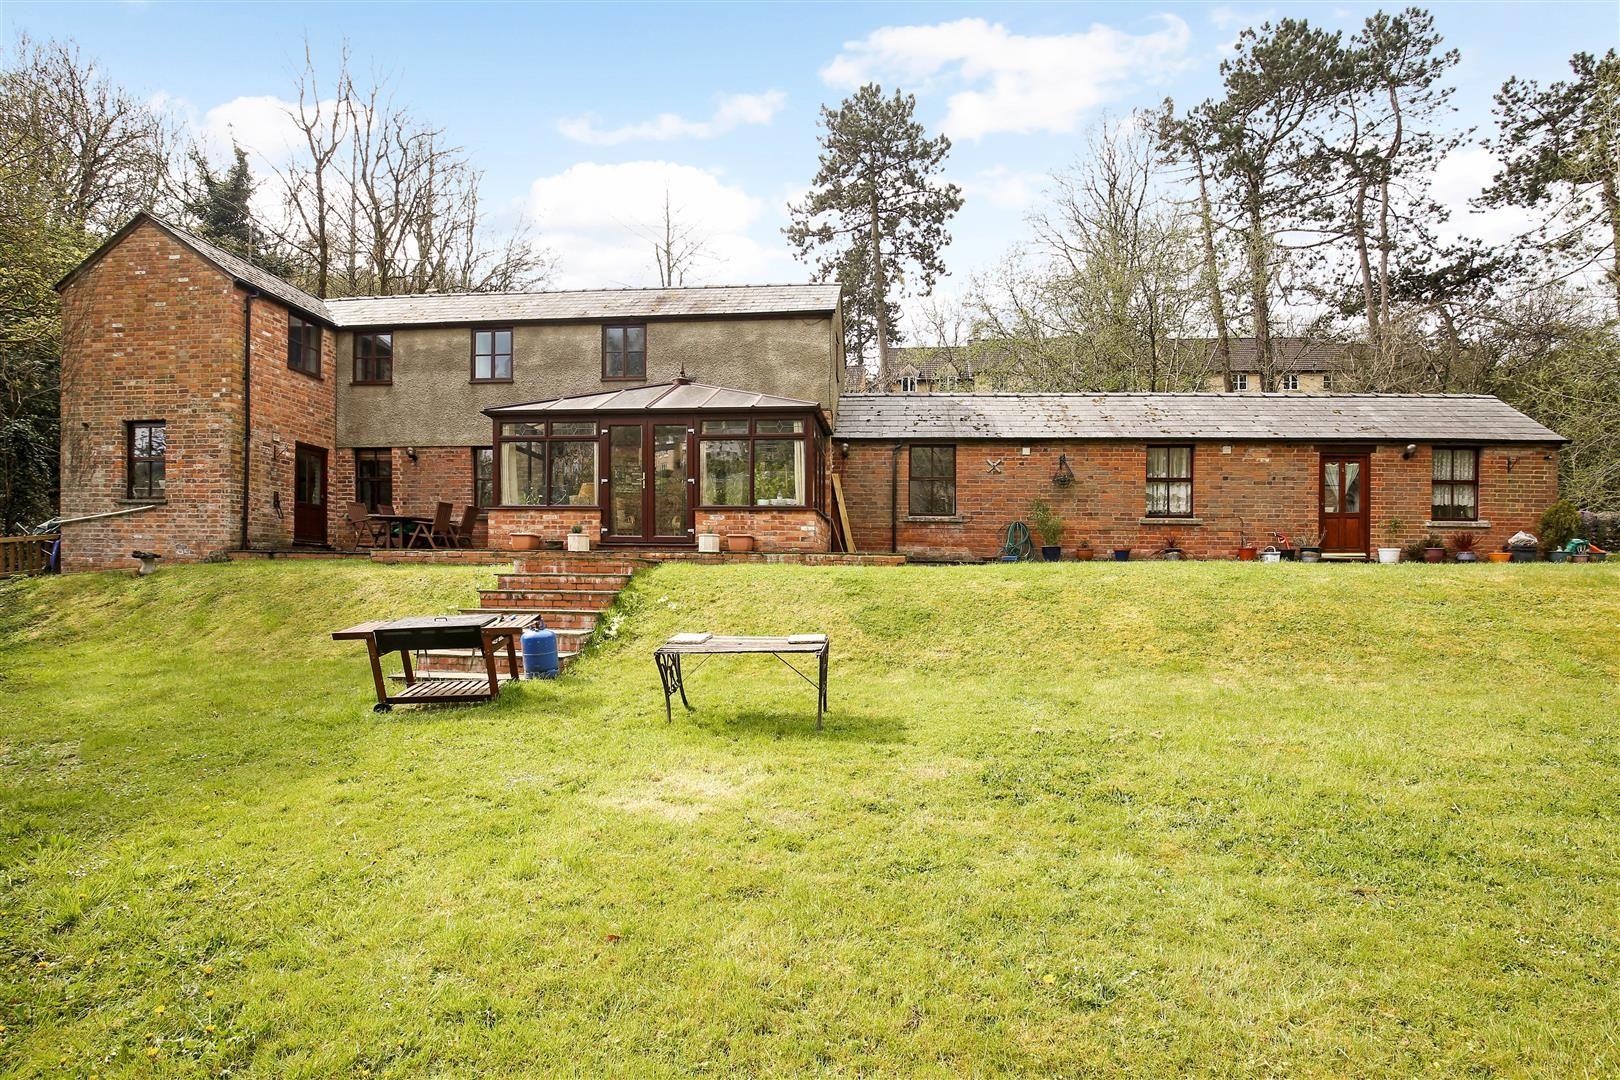 Property photo 1 of 34. Ph45_2836753.Jpg